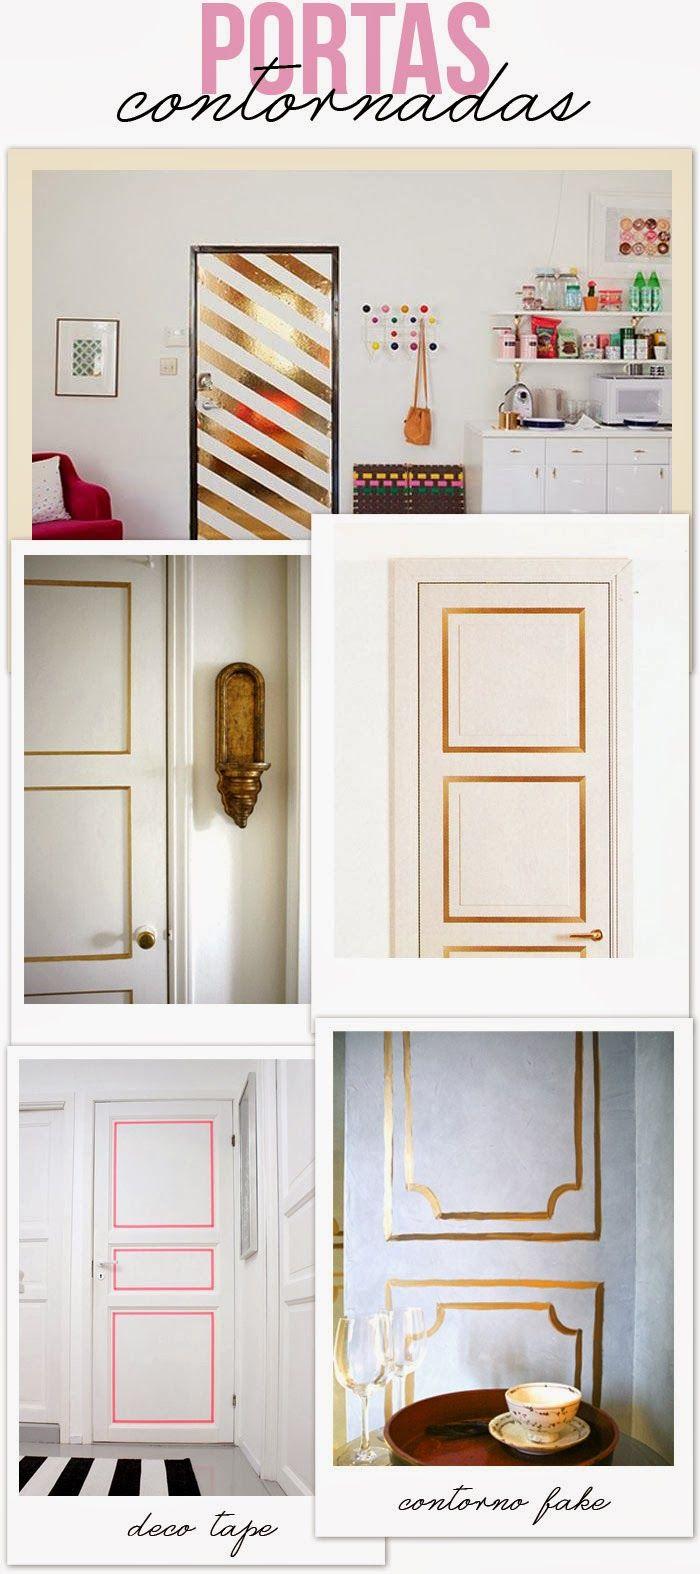 door - frame - outline - idea - gold - decotape - diy